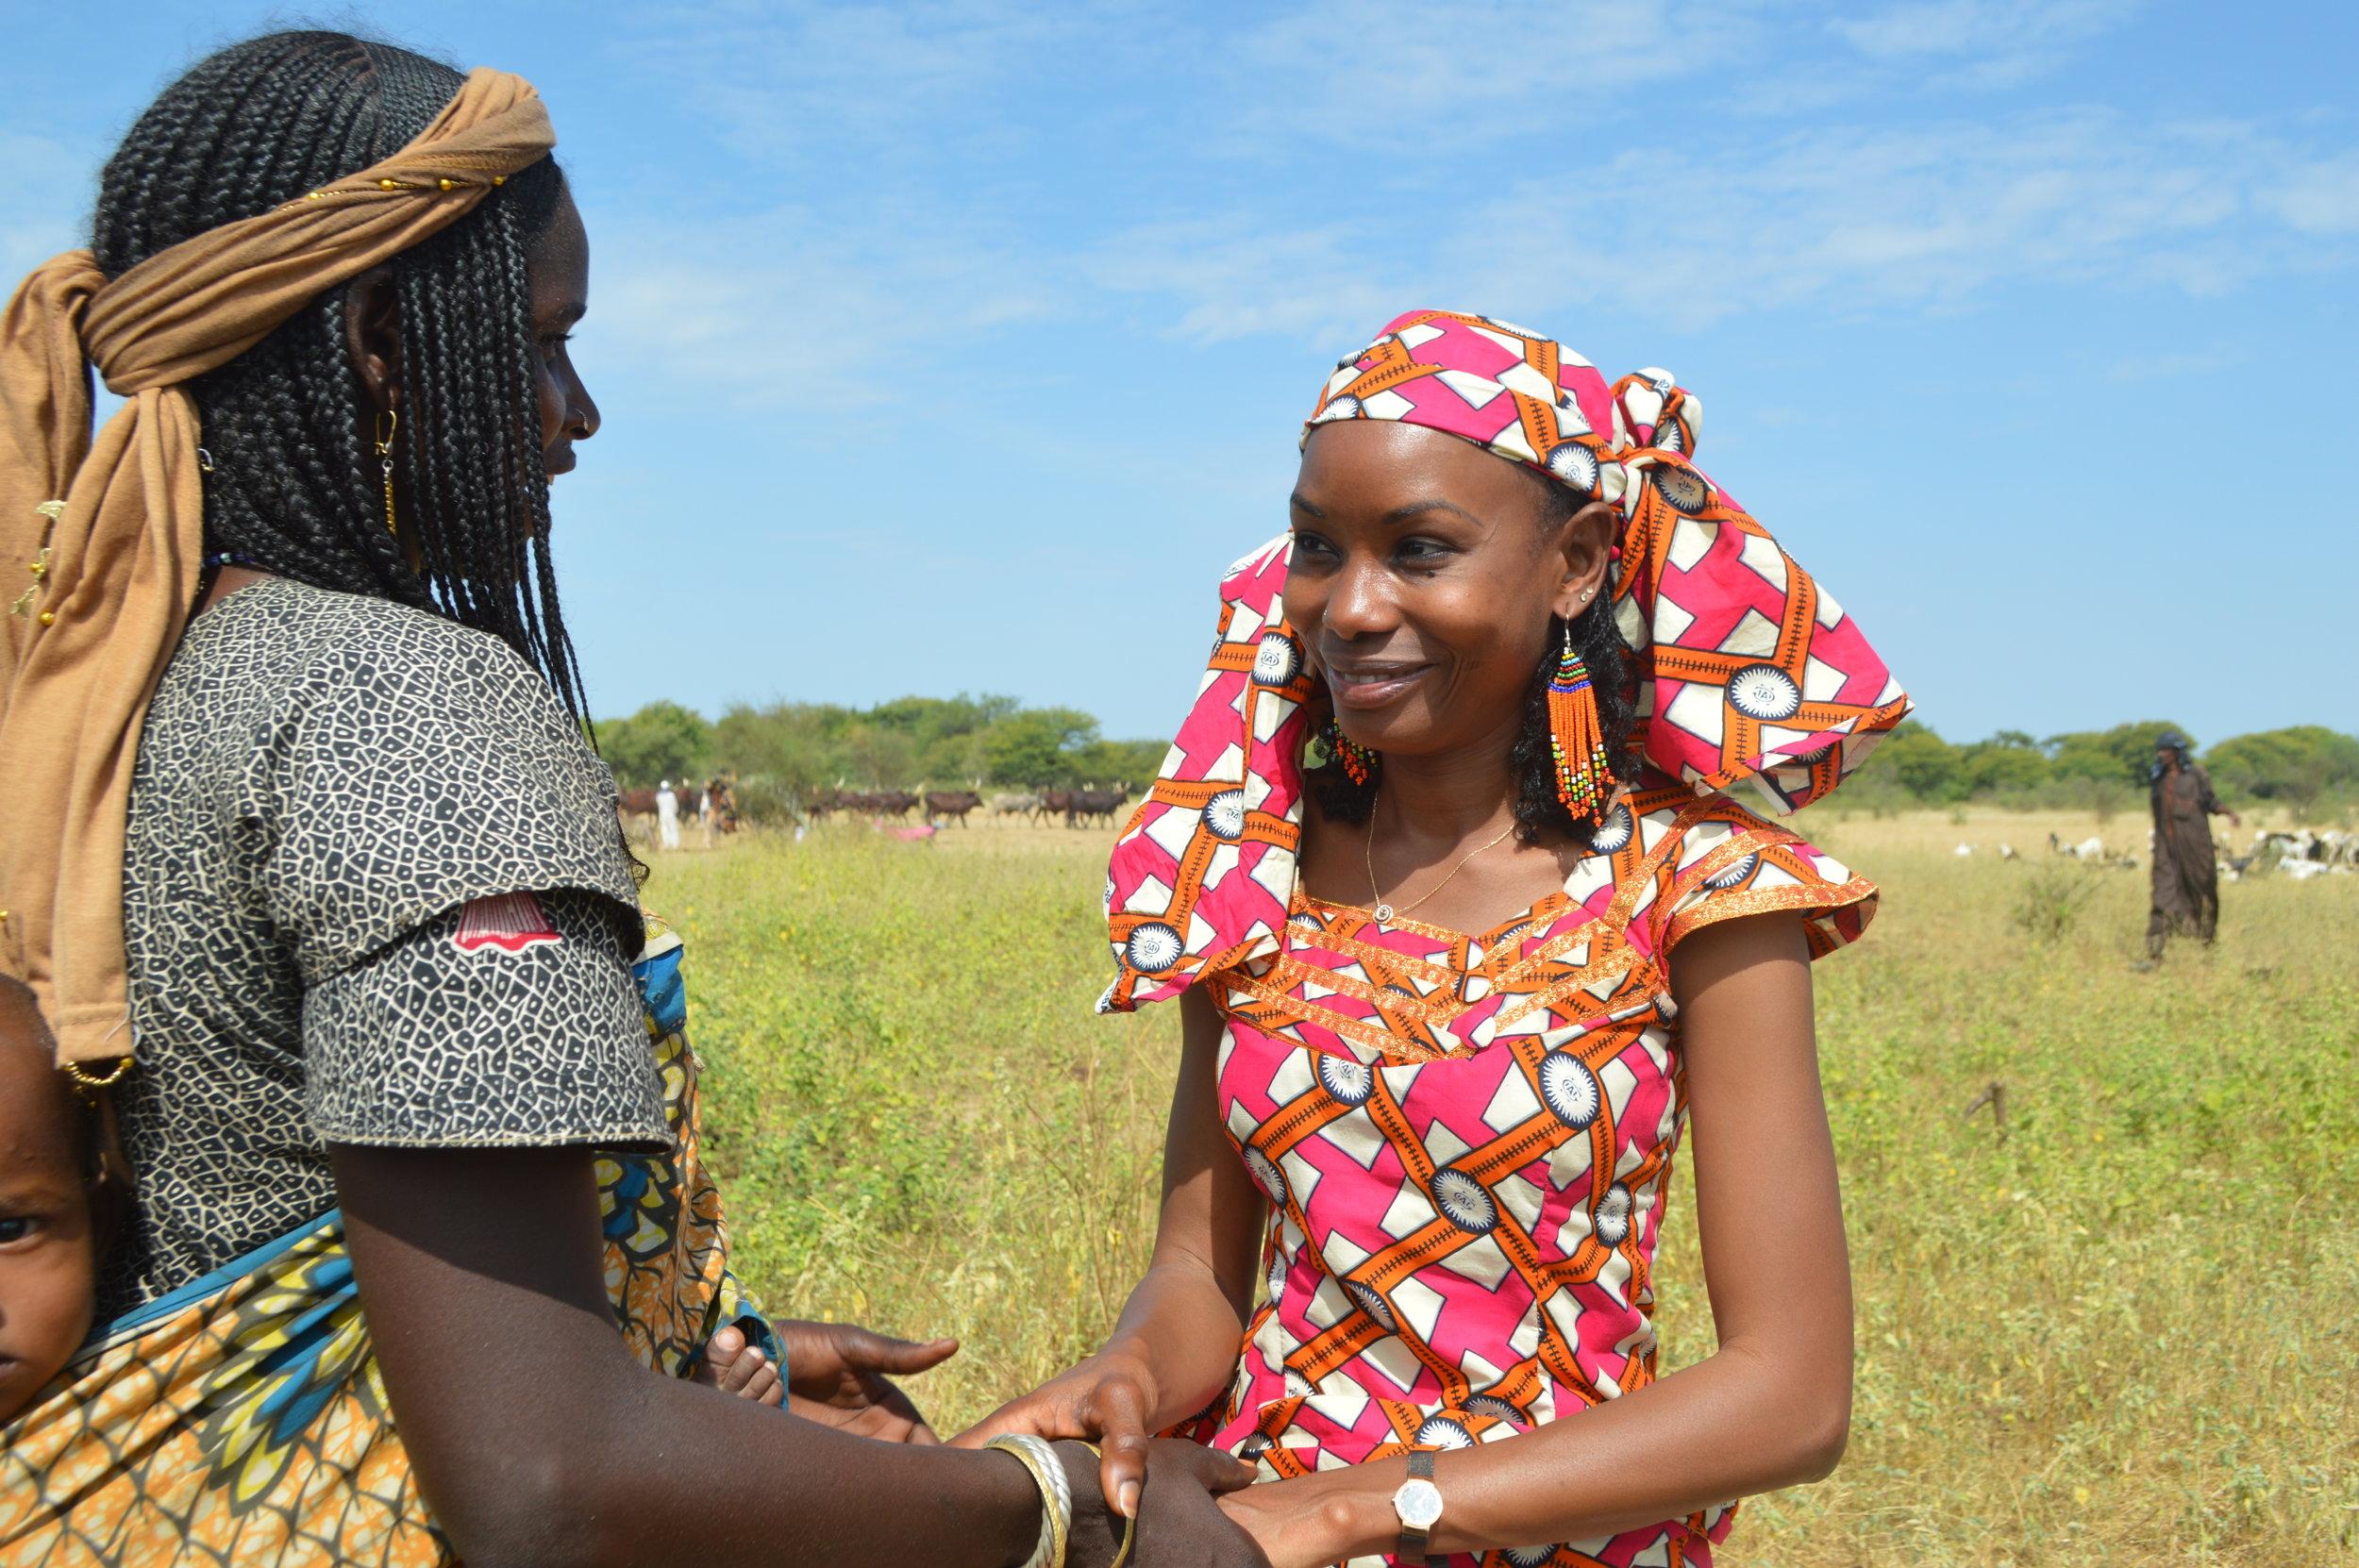 Hindou Ibrahim discussing women's empowerment in her Mbororo pastoralist community in Chad.